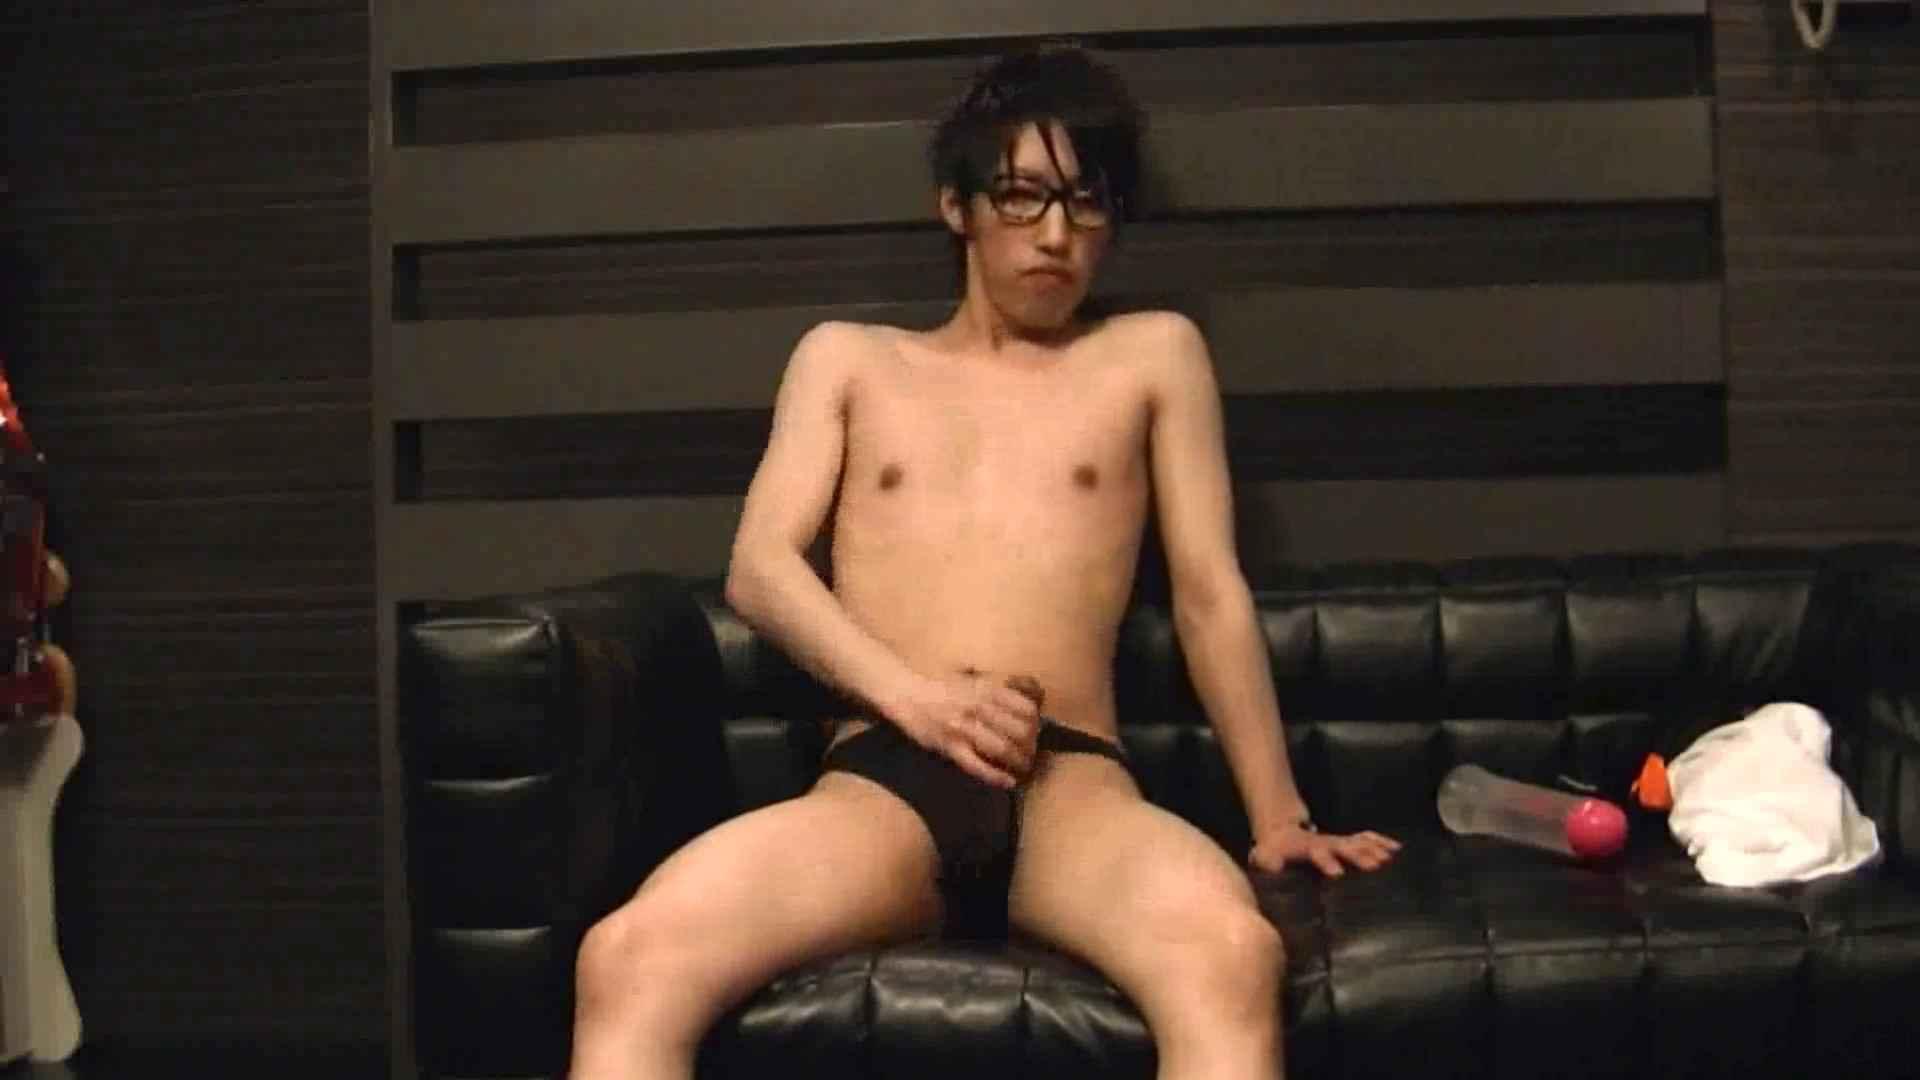 ONA見せカーニバル!! Vol3 男 ゲイ無料無修正画像 89枚 36